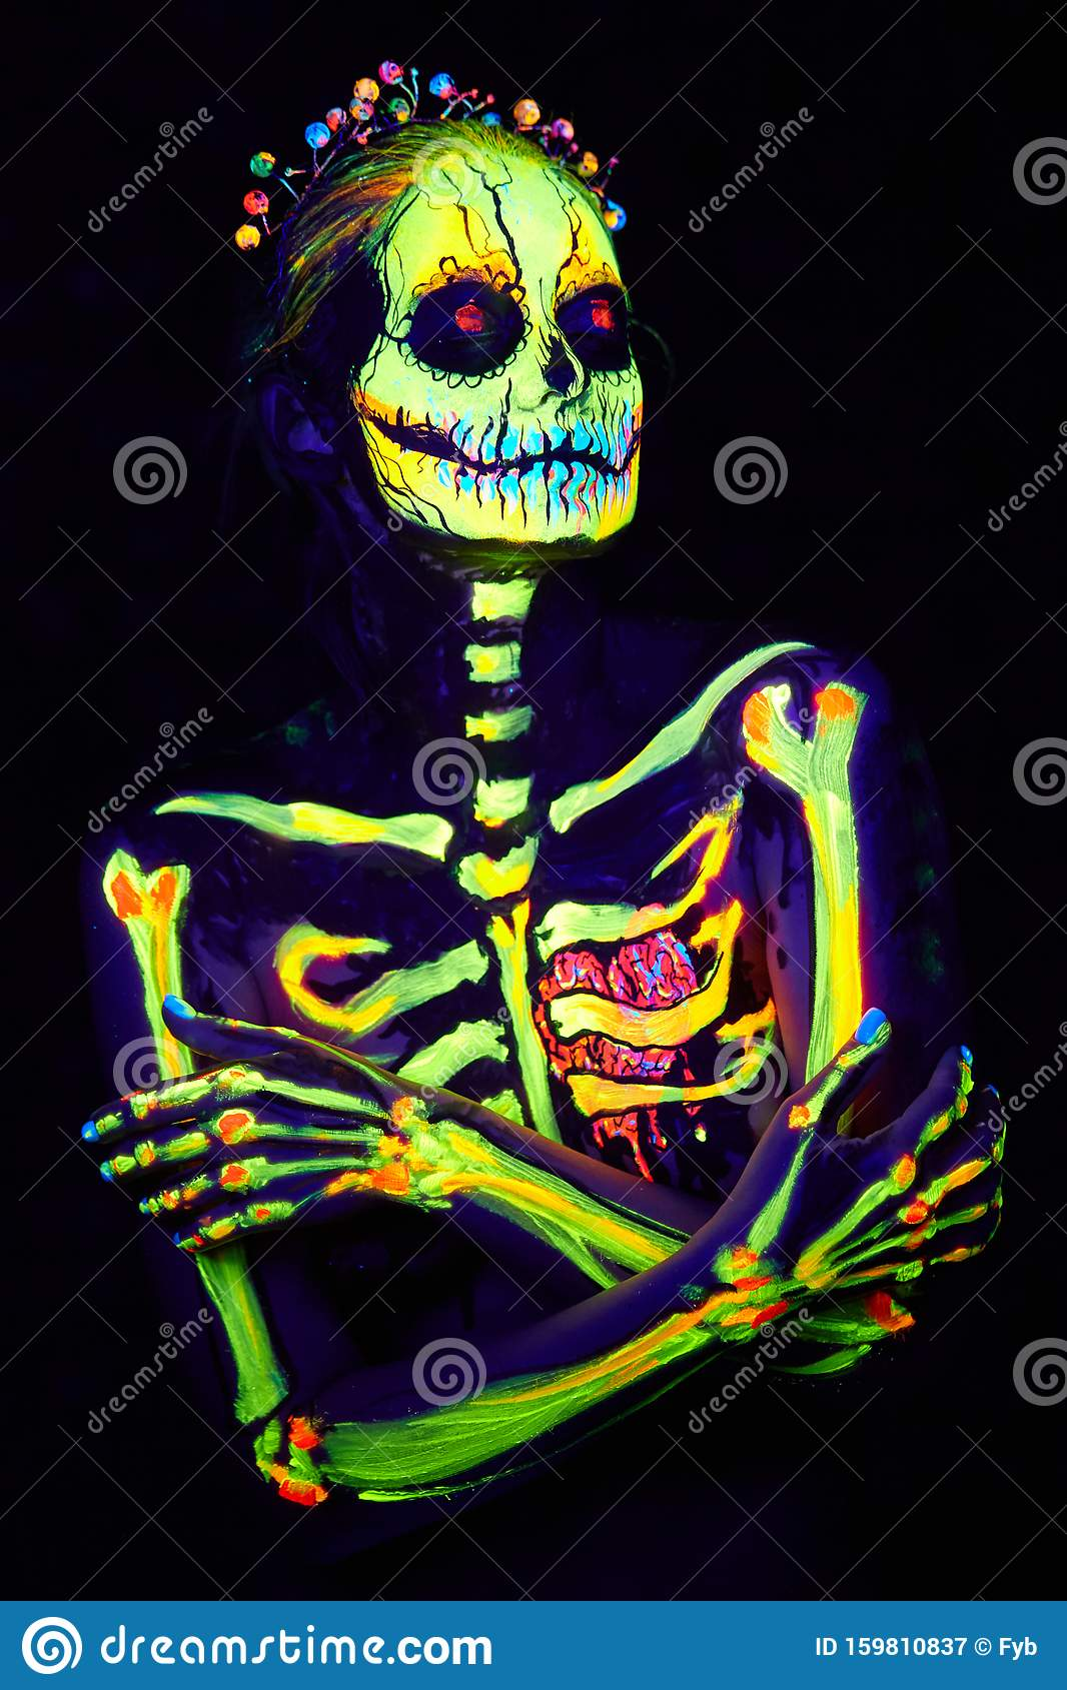 Uv Body Art Painting Of Helloween Female Skeleton Stock Image Image Of Disco Beauty 159810837